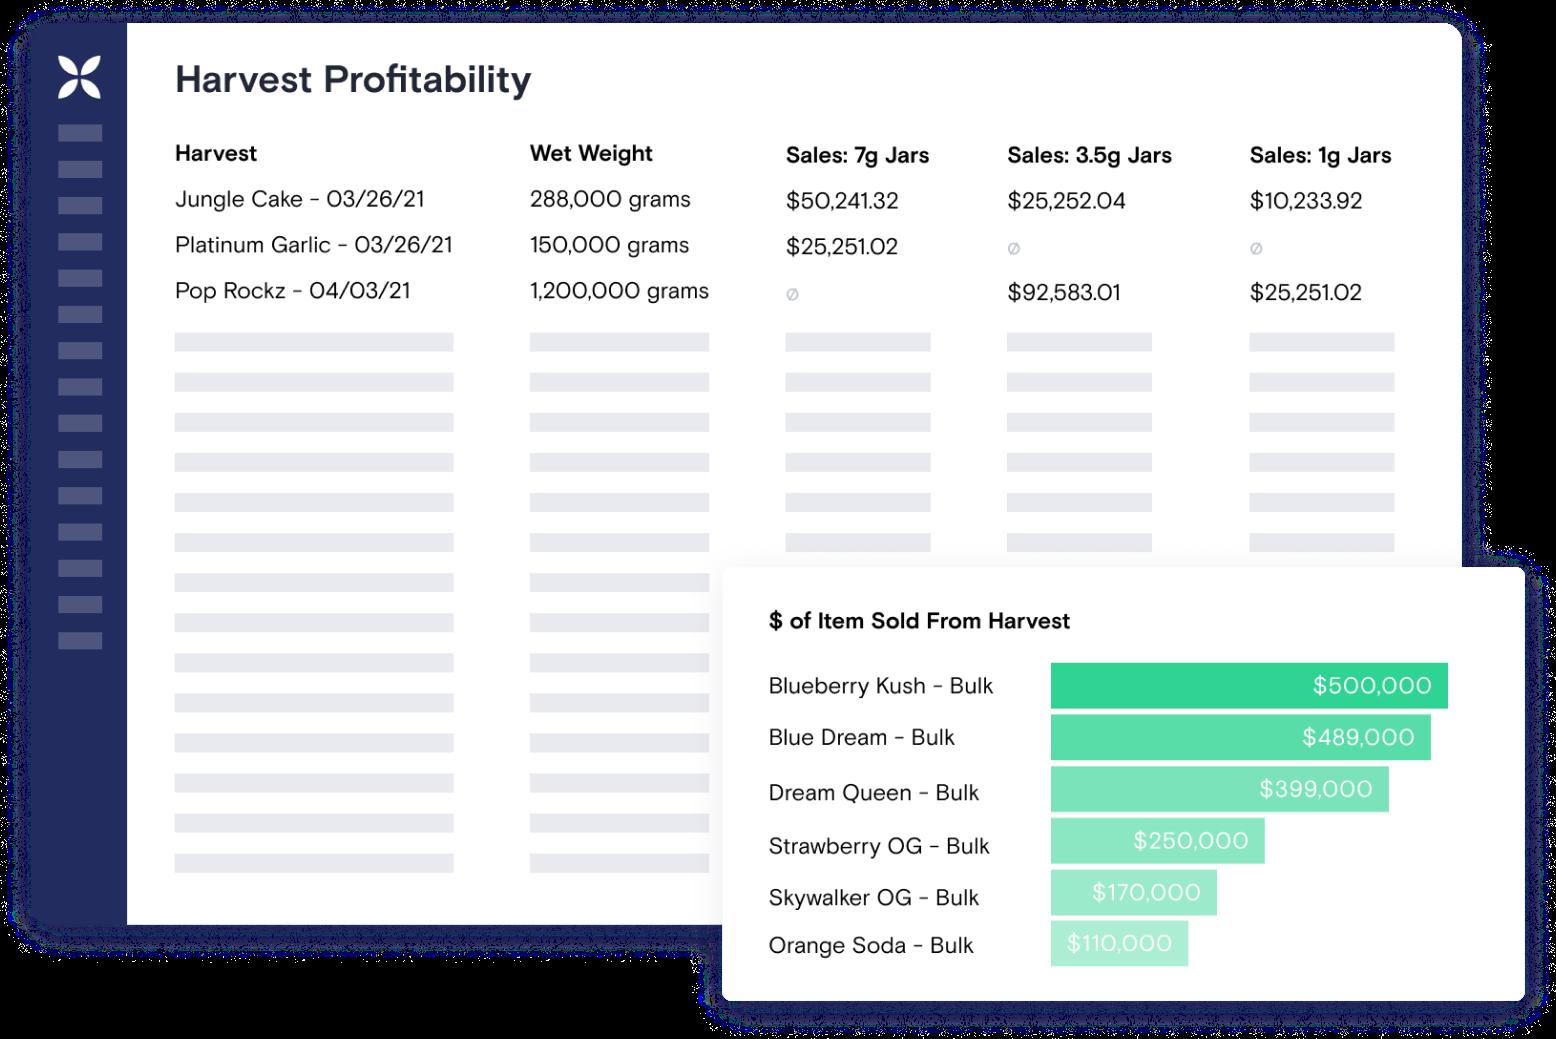 Harvest profitability